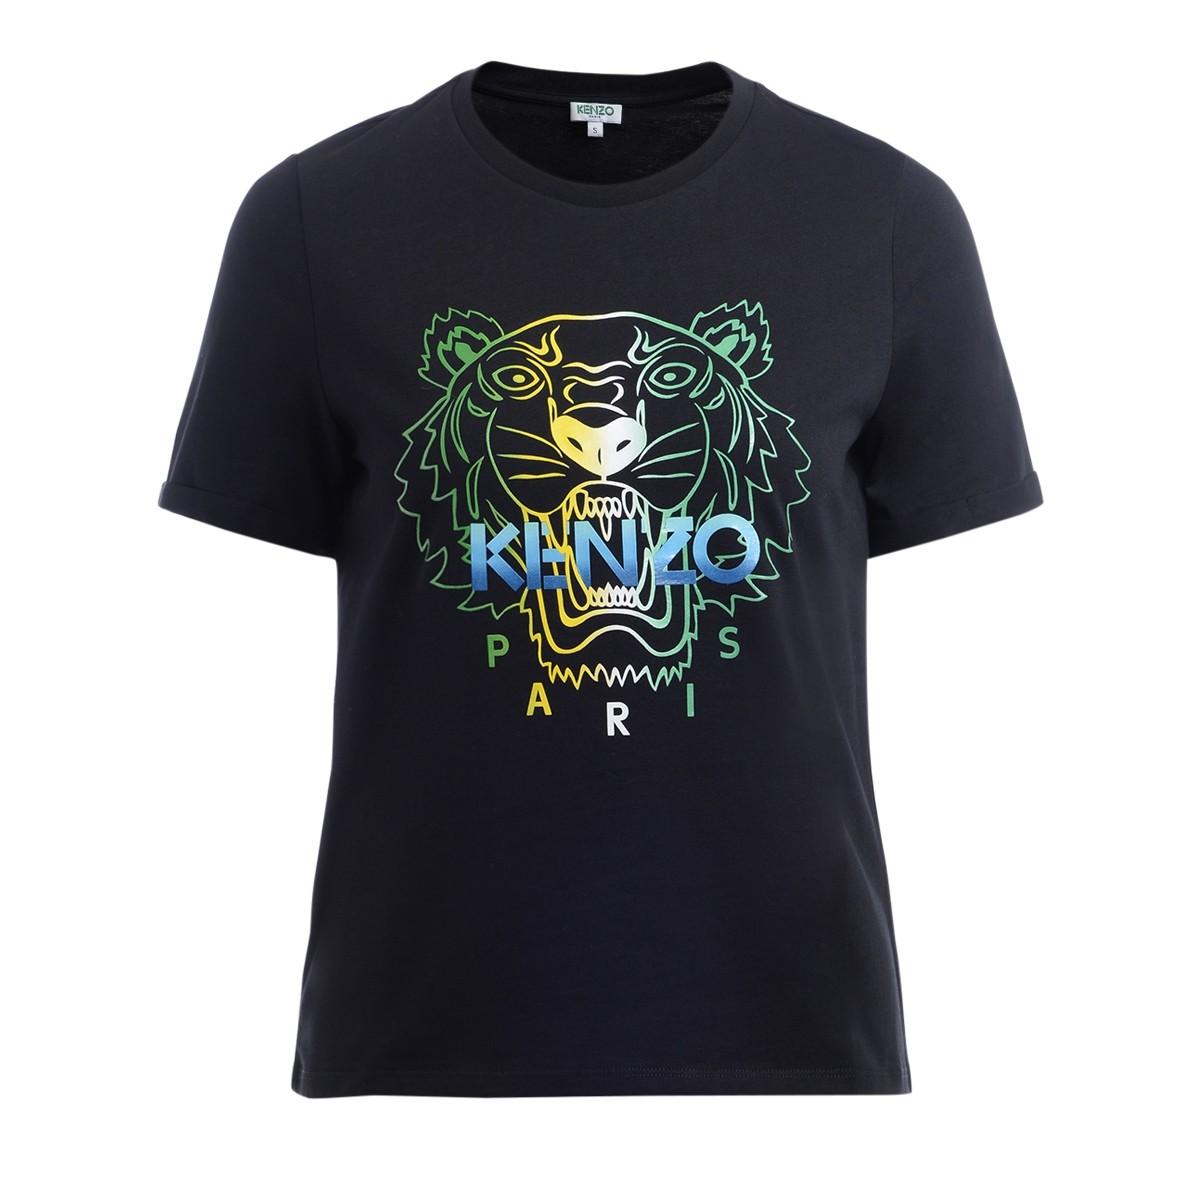 Kenzo Tigre black cotton t shirt with multicolor logo